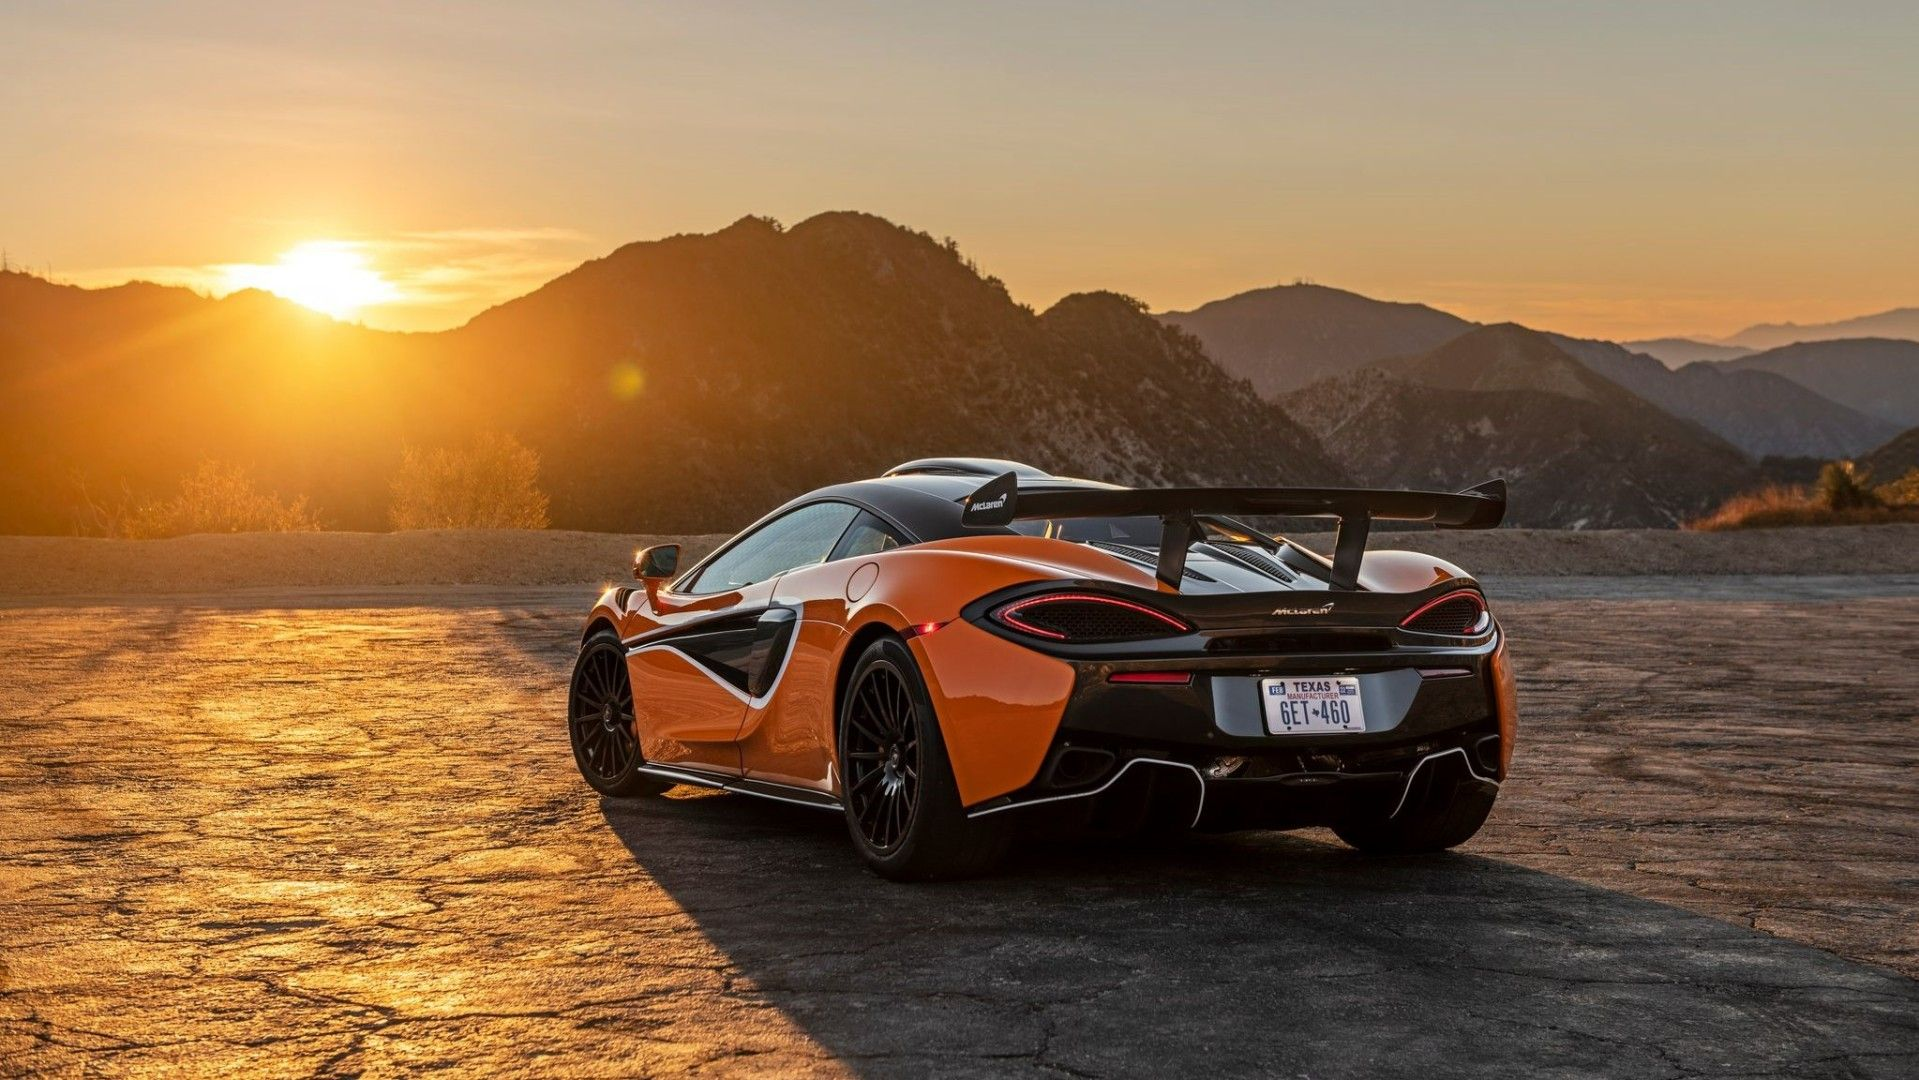 Broche final a la gama Sports Series de McLaren